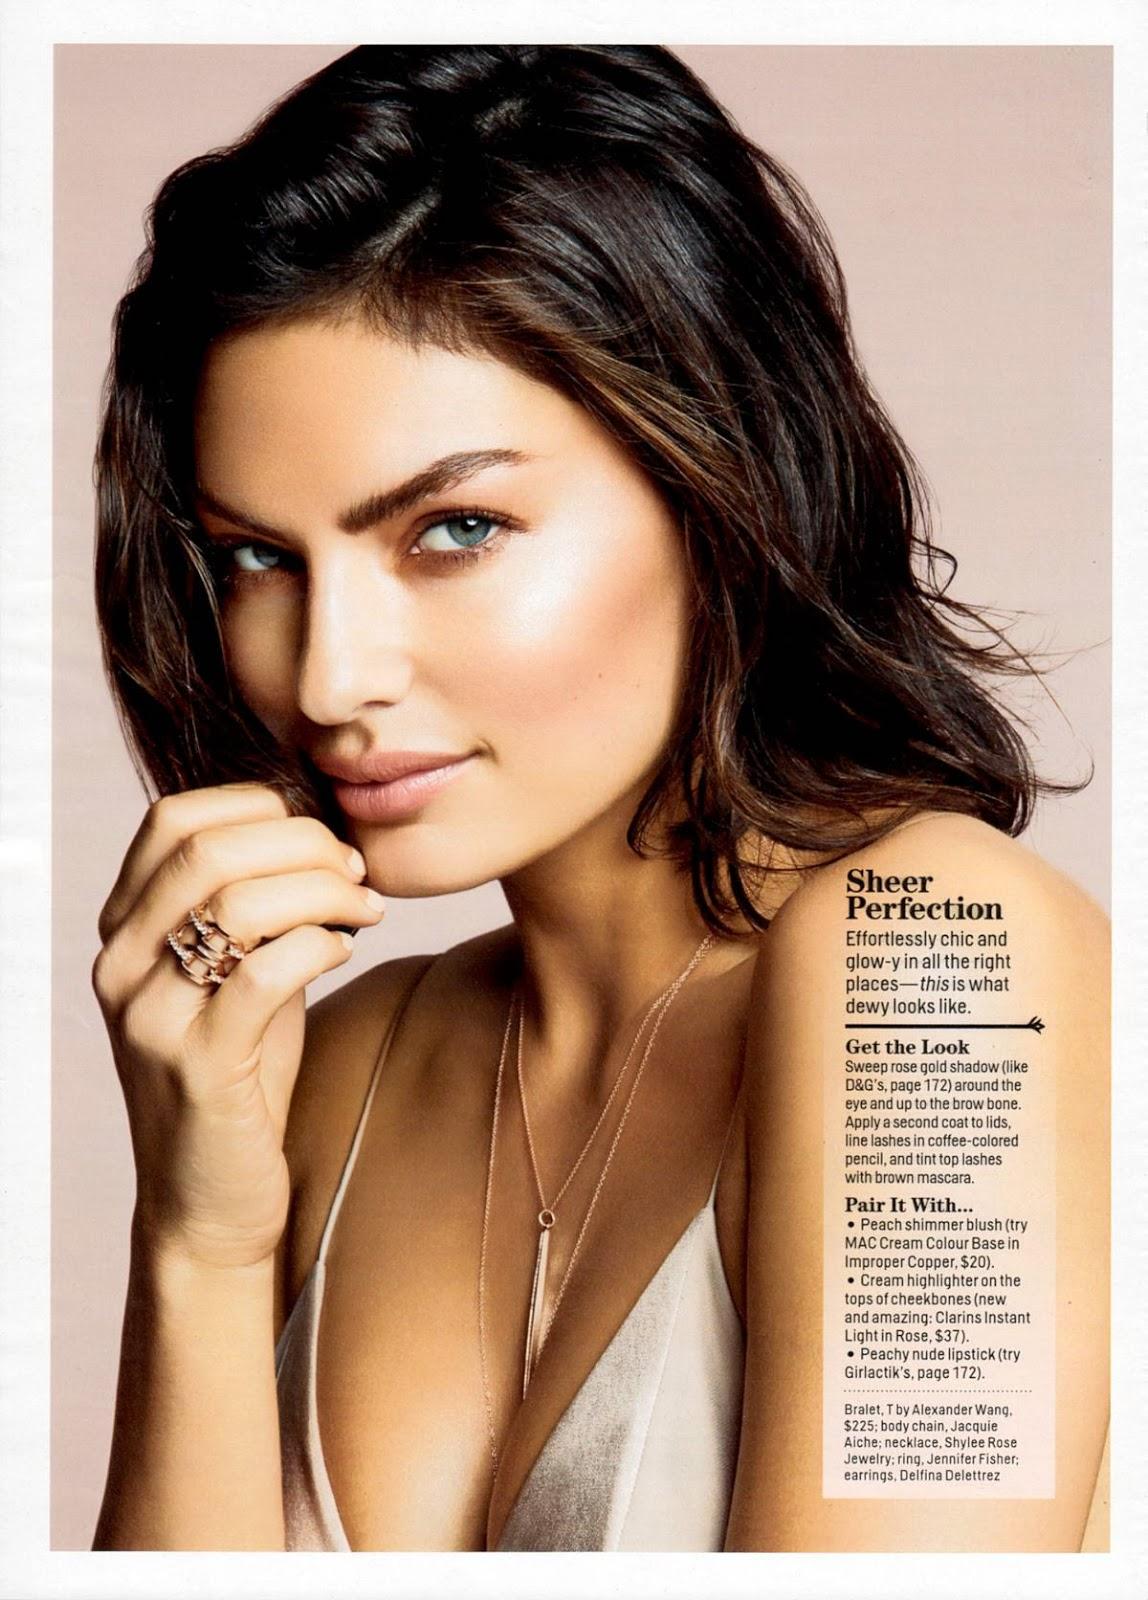 Magazine Photoshoot : Alyssa Miller Hot Photoshoot For Cosmopolitan Magazine February 2014 Issue